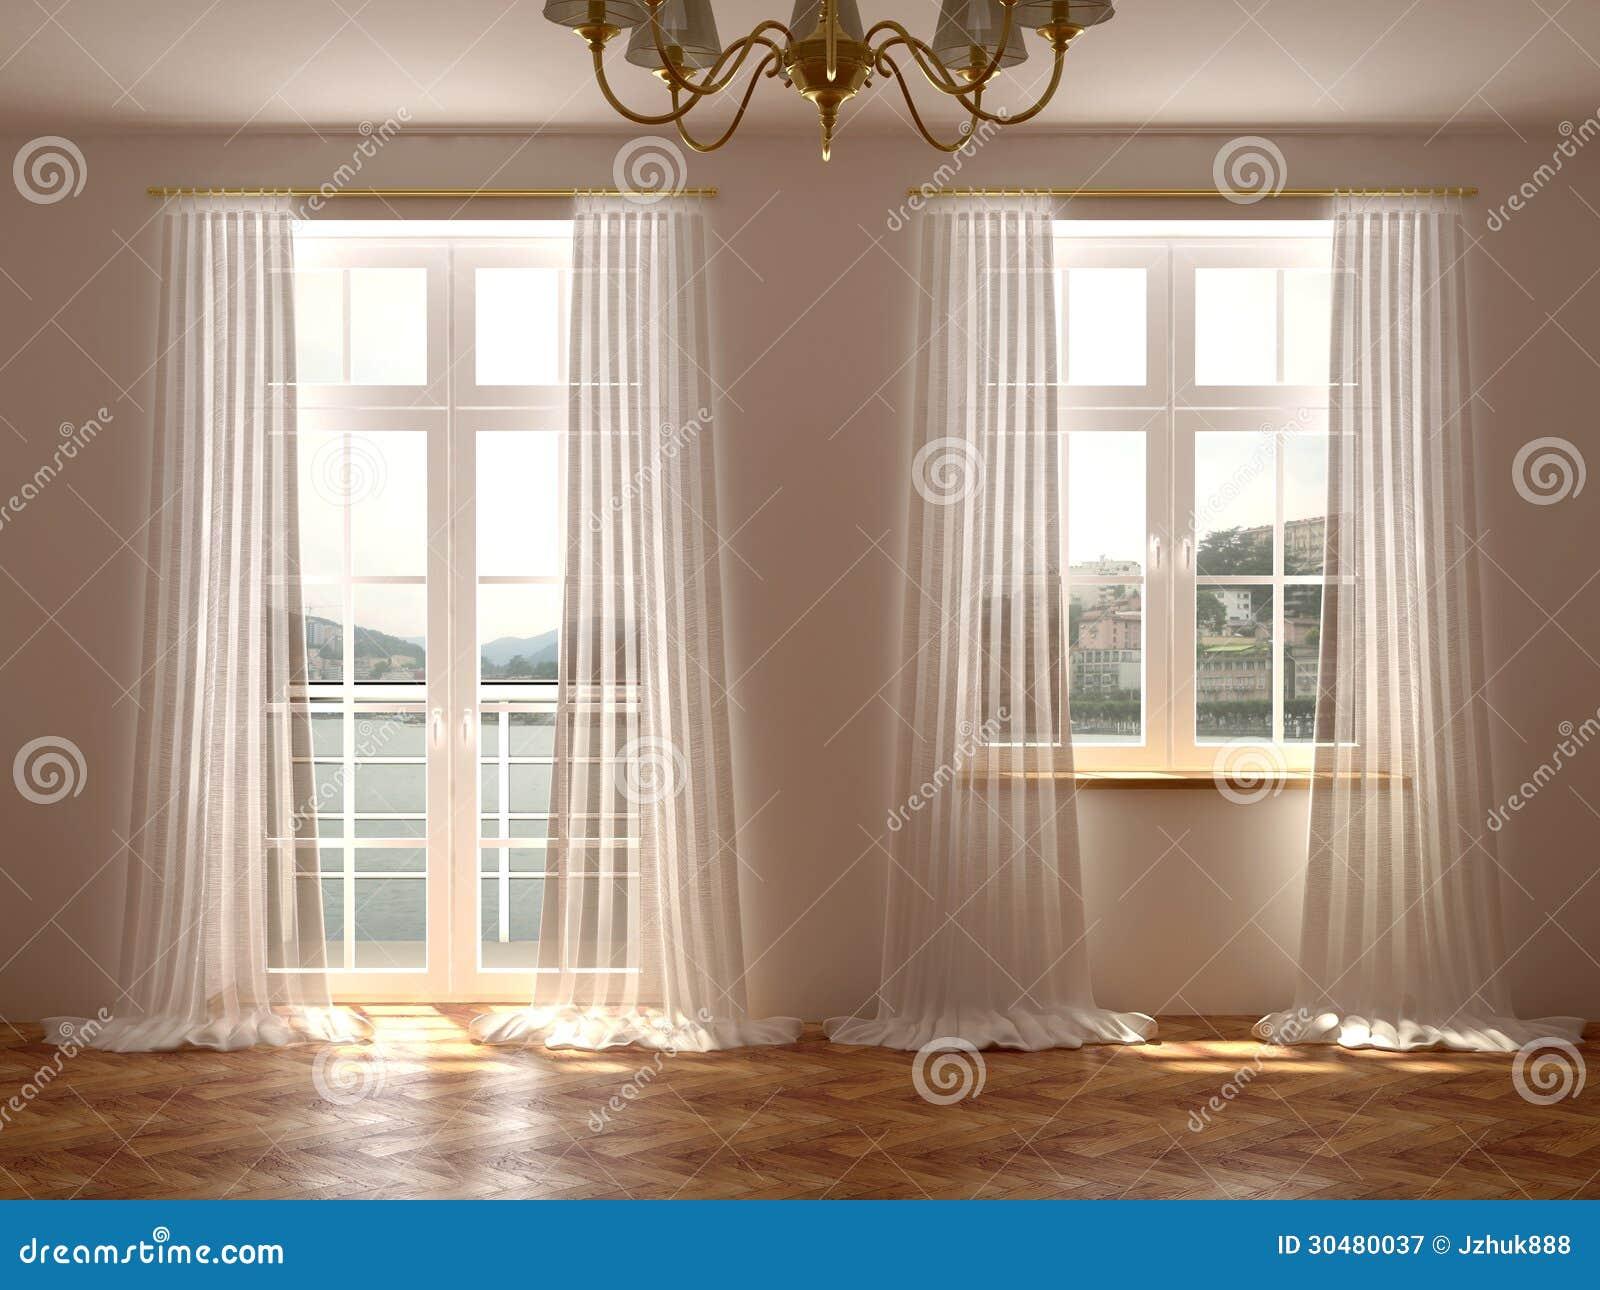 room with windows and balcony door royalty free stock